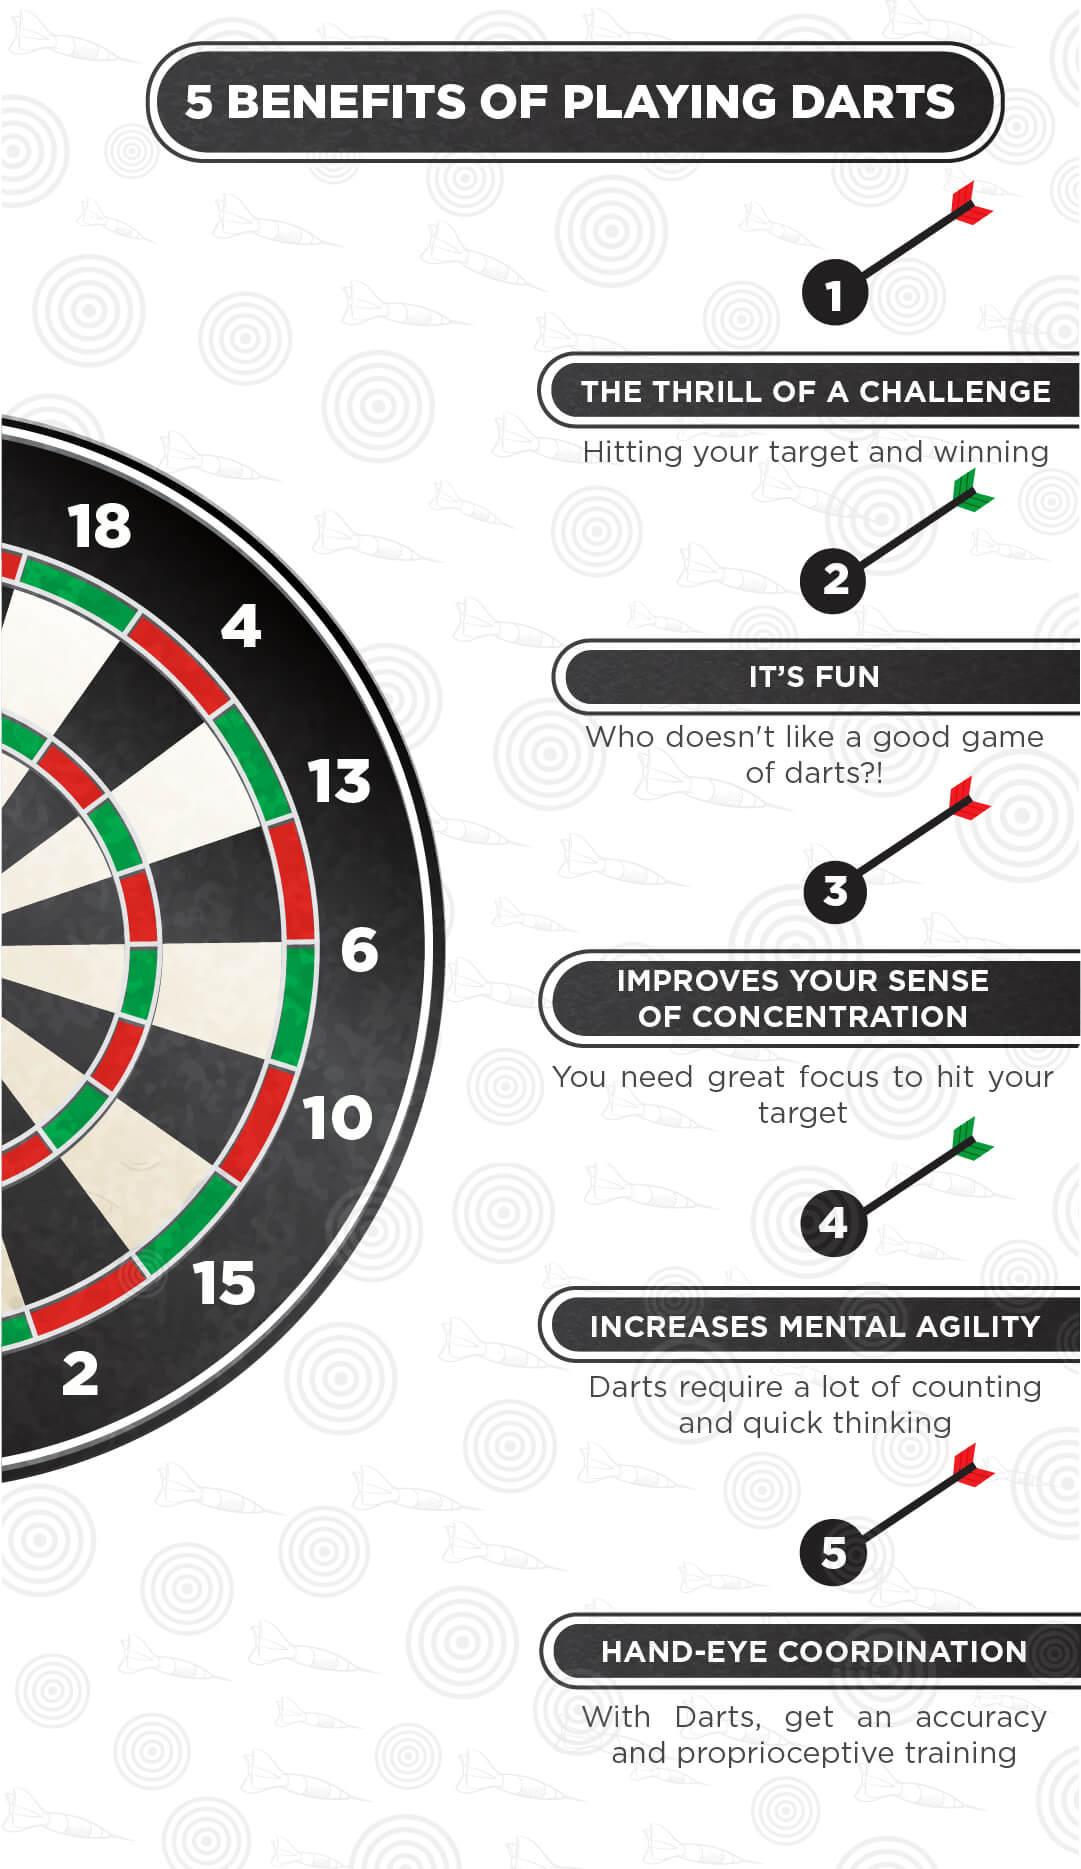 5 Benefits of Playing Darts